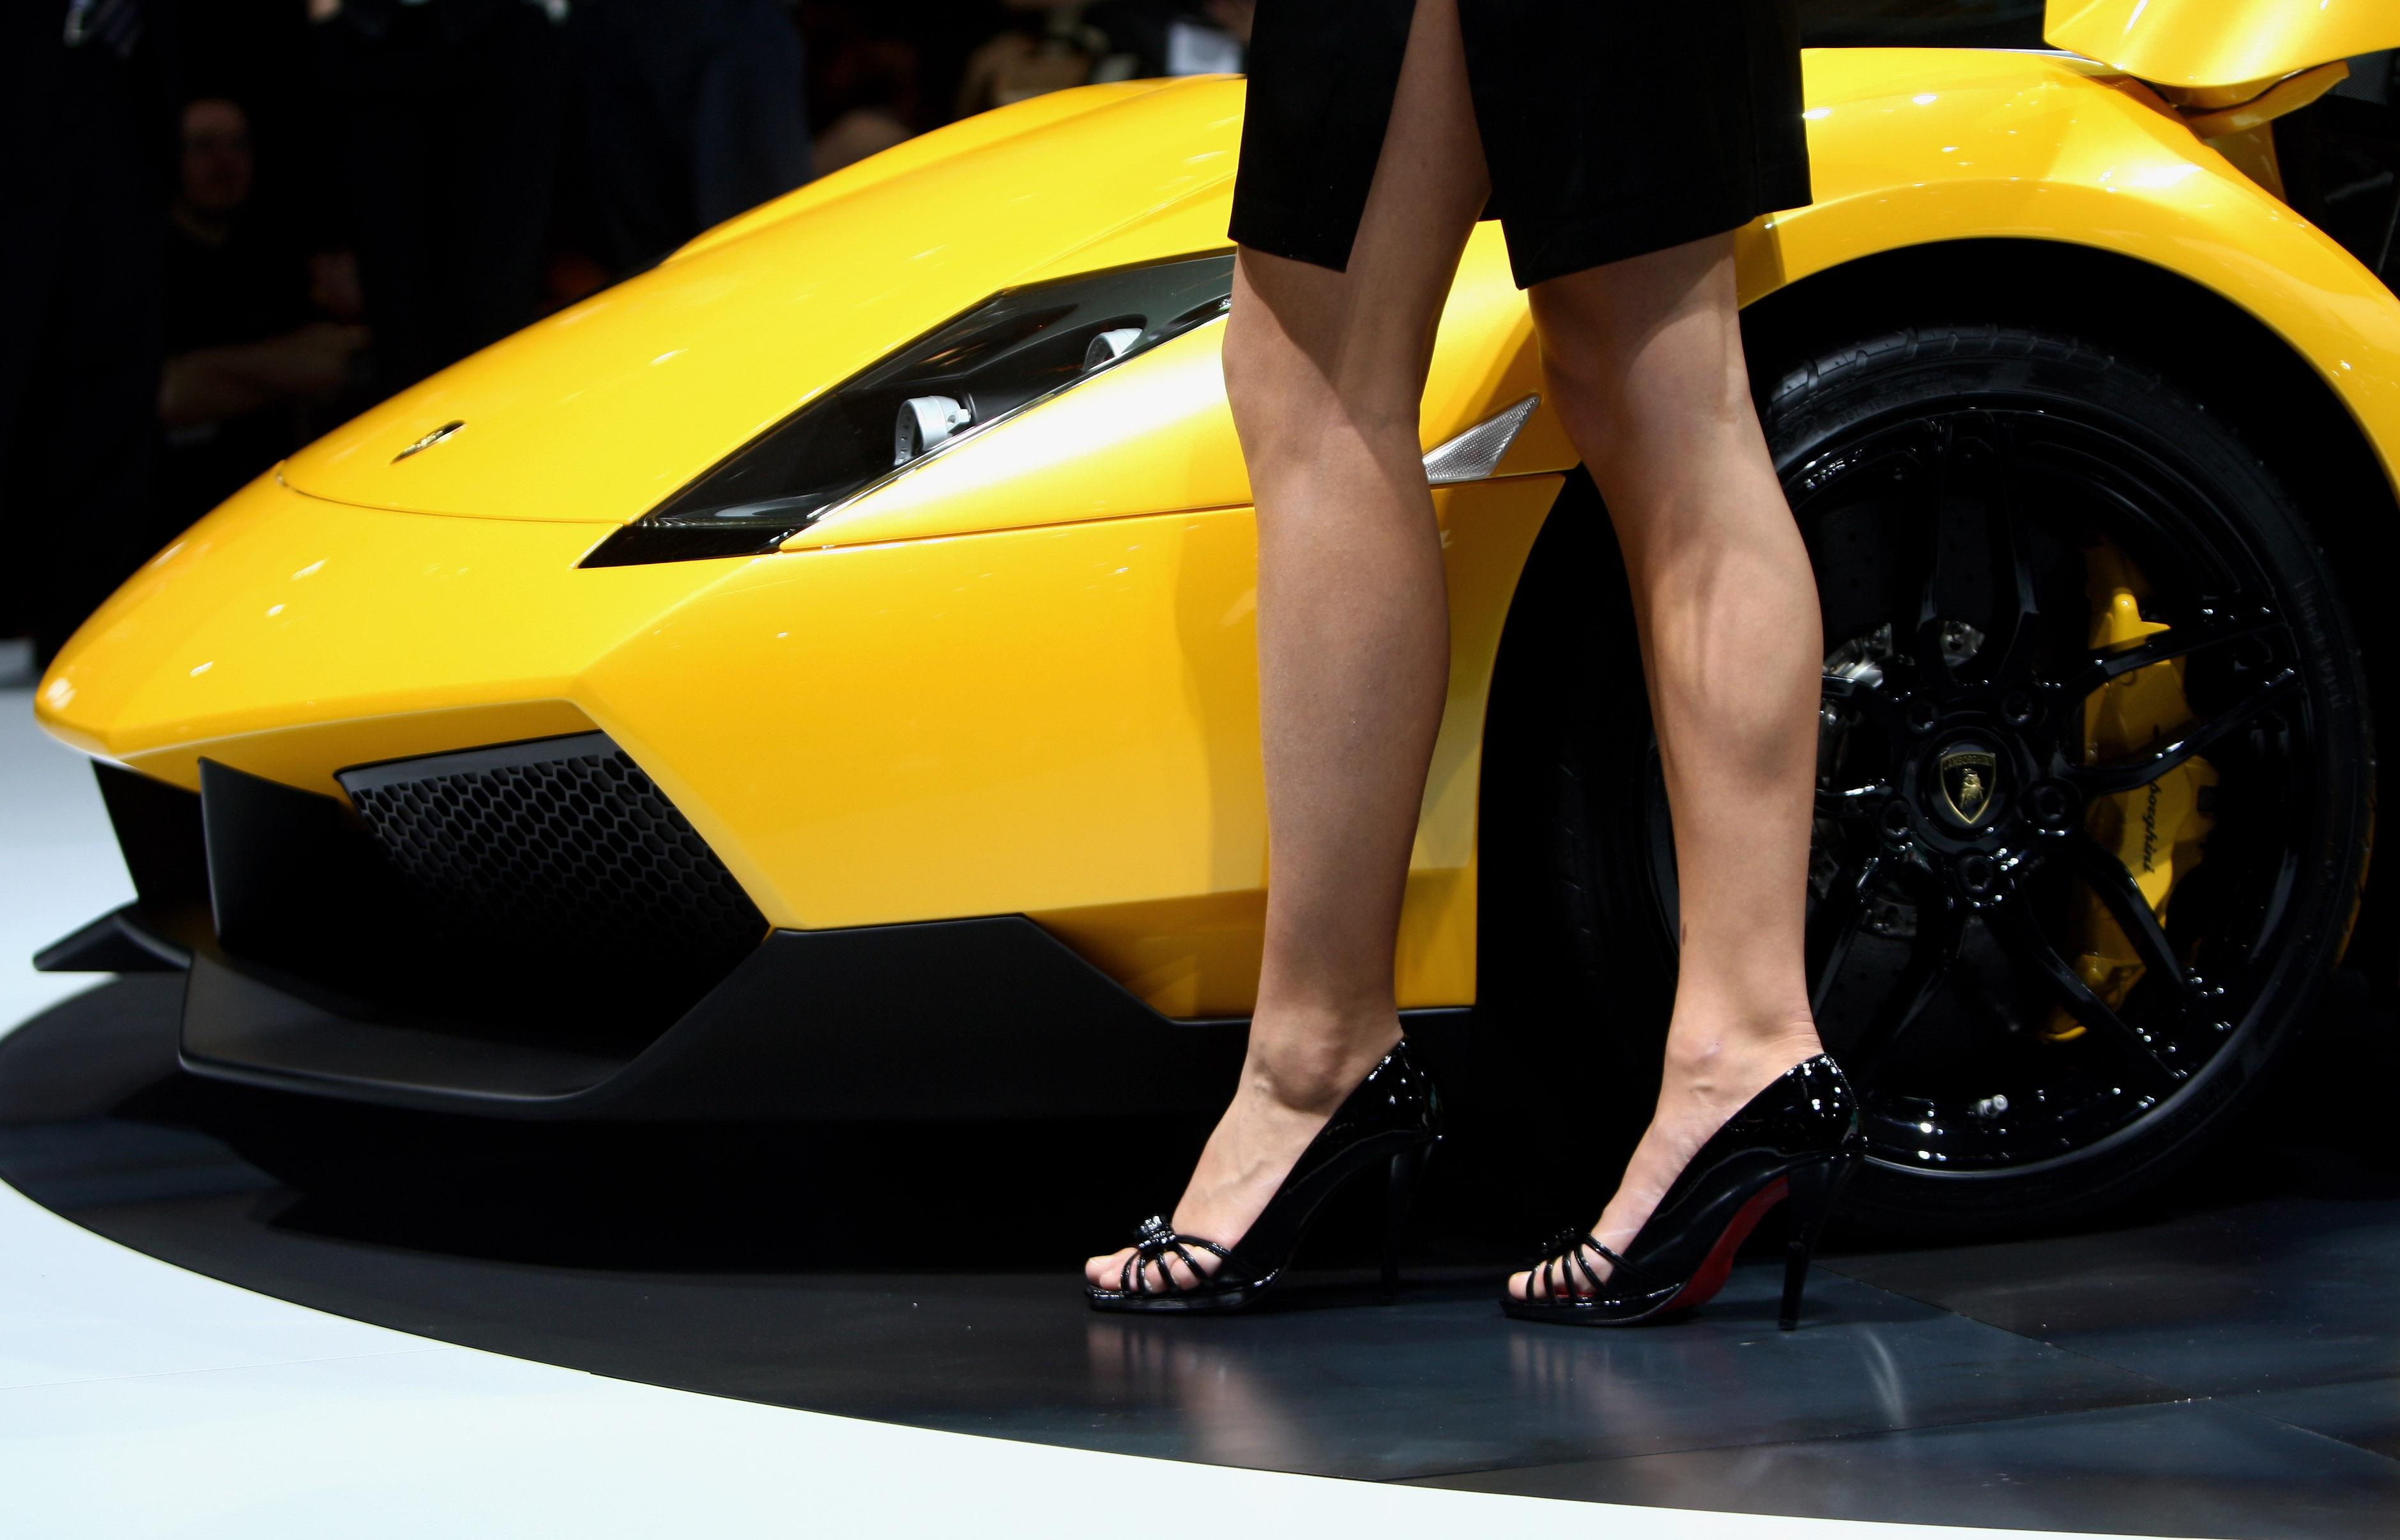 Geneva Motor Show 2018 >> Geneva Motor Show 2018 Booth Babes Are Being Banished